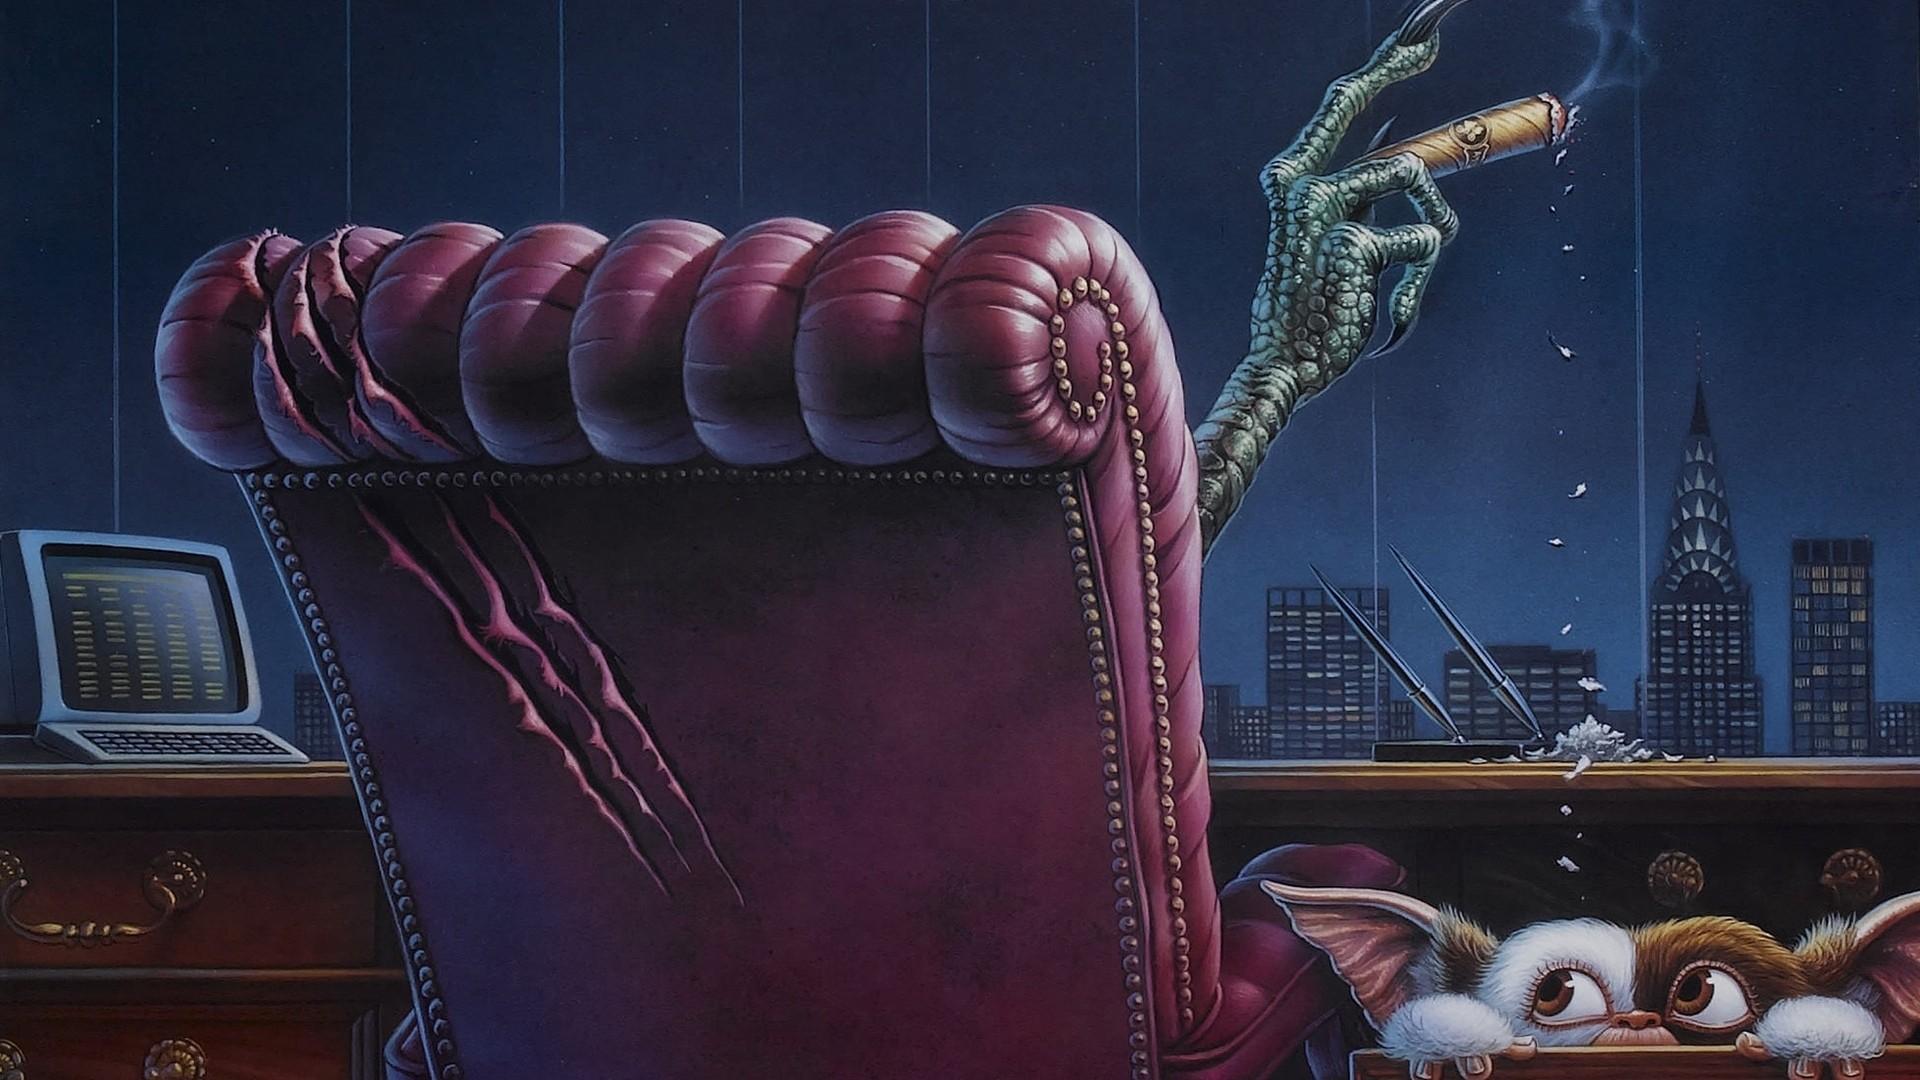 Res: 1920x1080, Filme - Gremlins 2: The New Batch Wallpaper